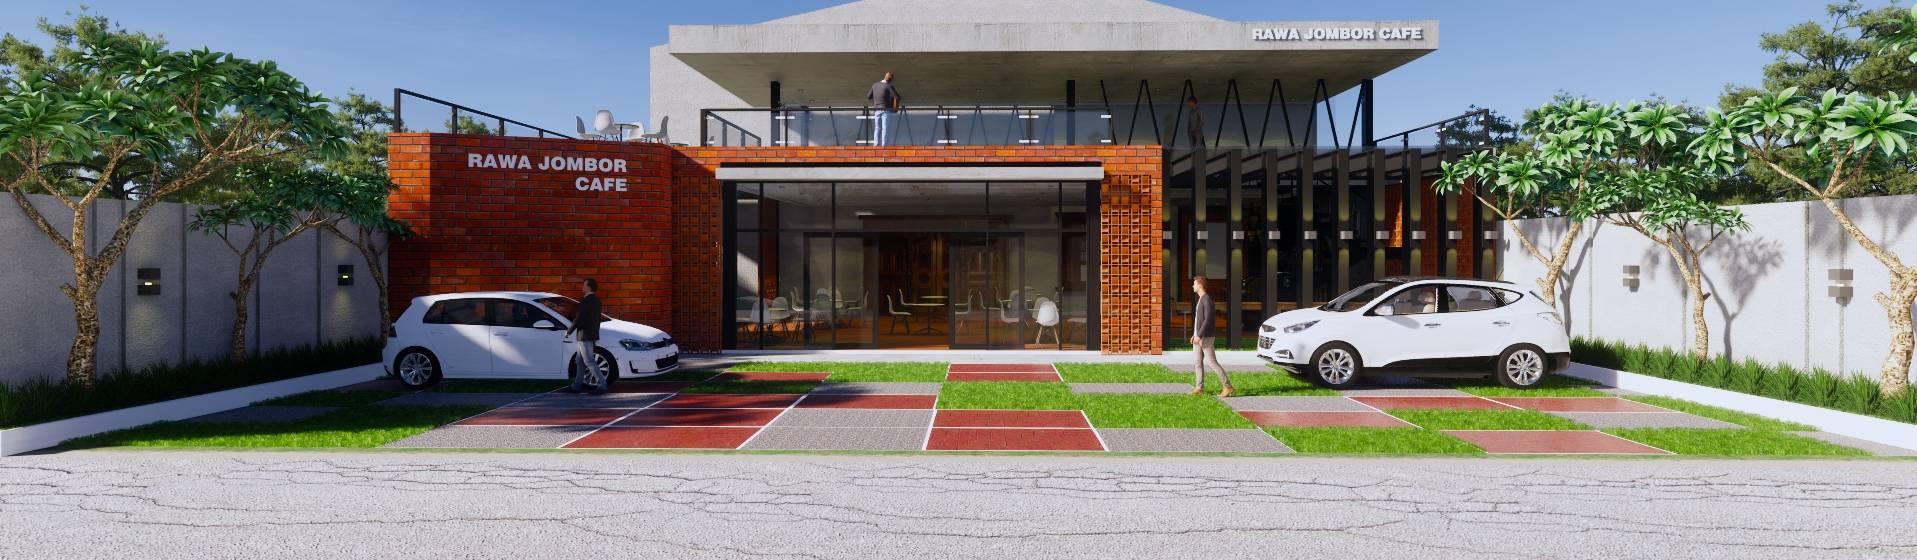 Chans Architect